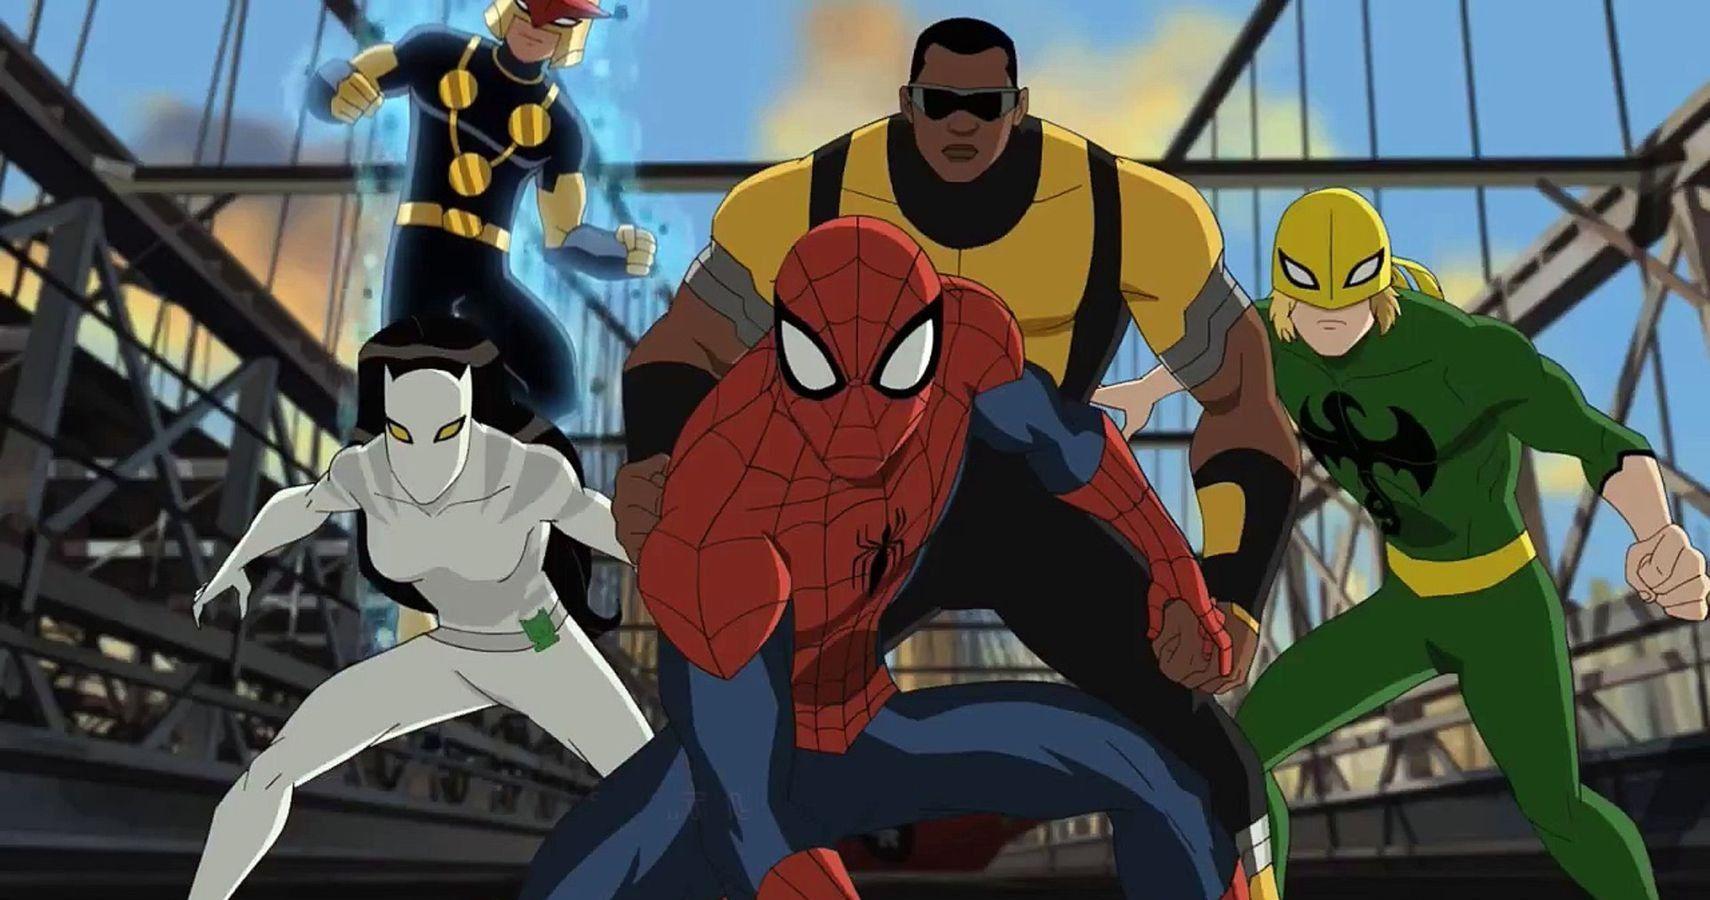 10 Best Episodes of Ultimate Spider-Man Season 2, According To IMDB